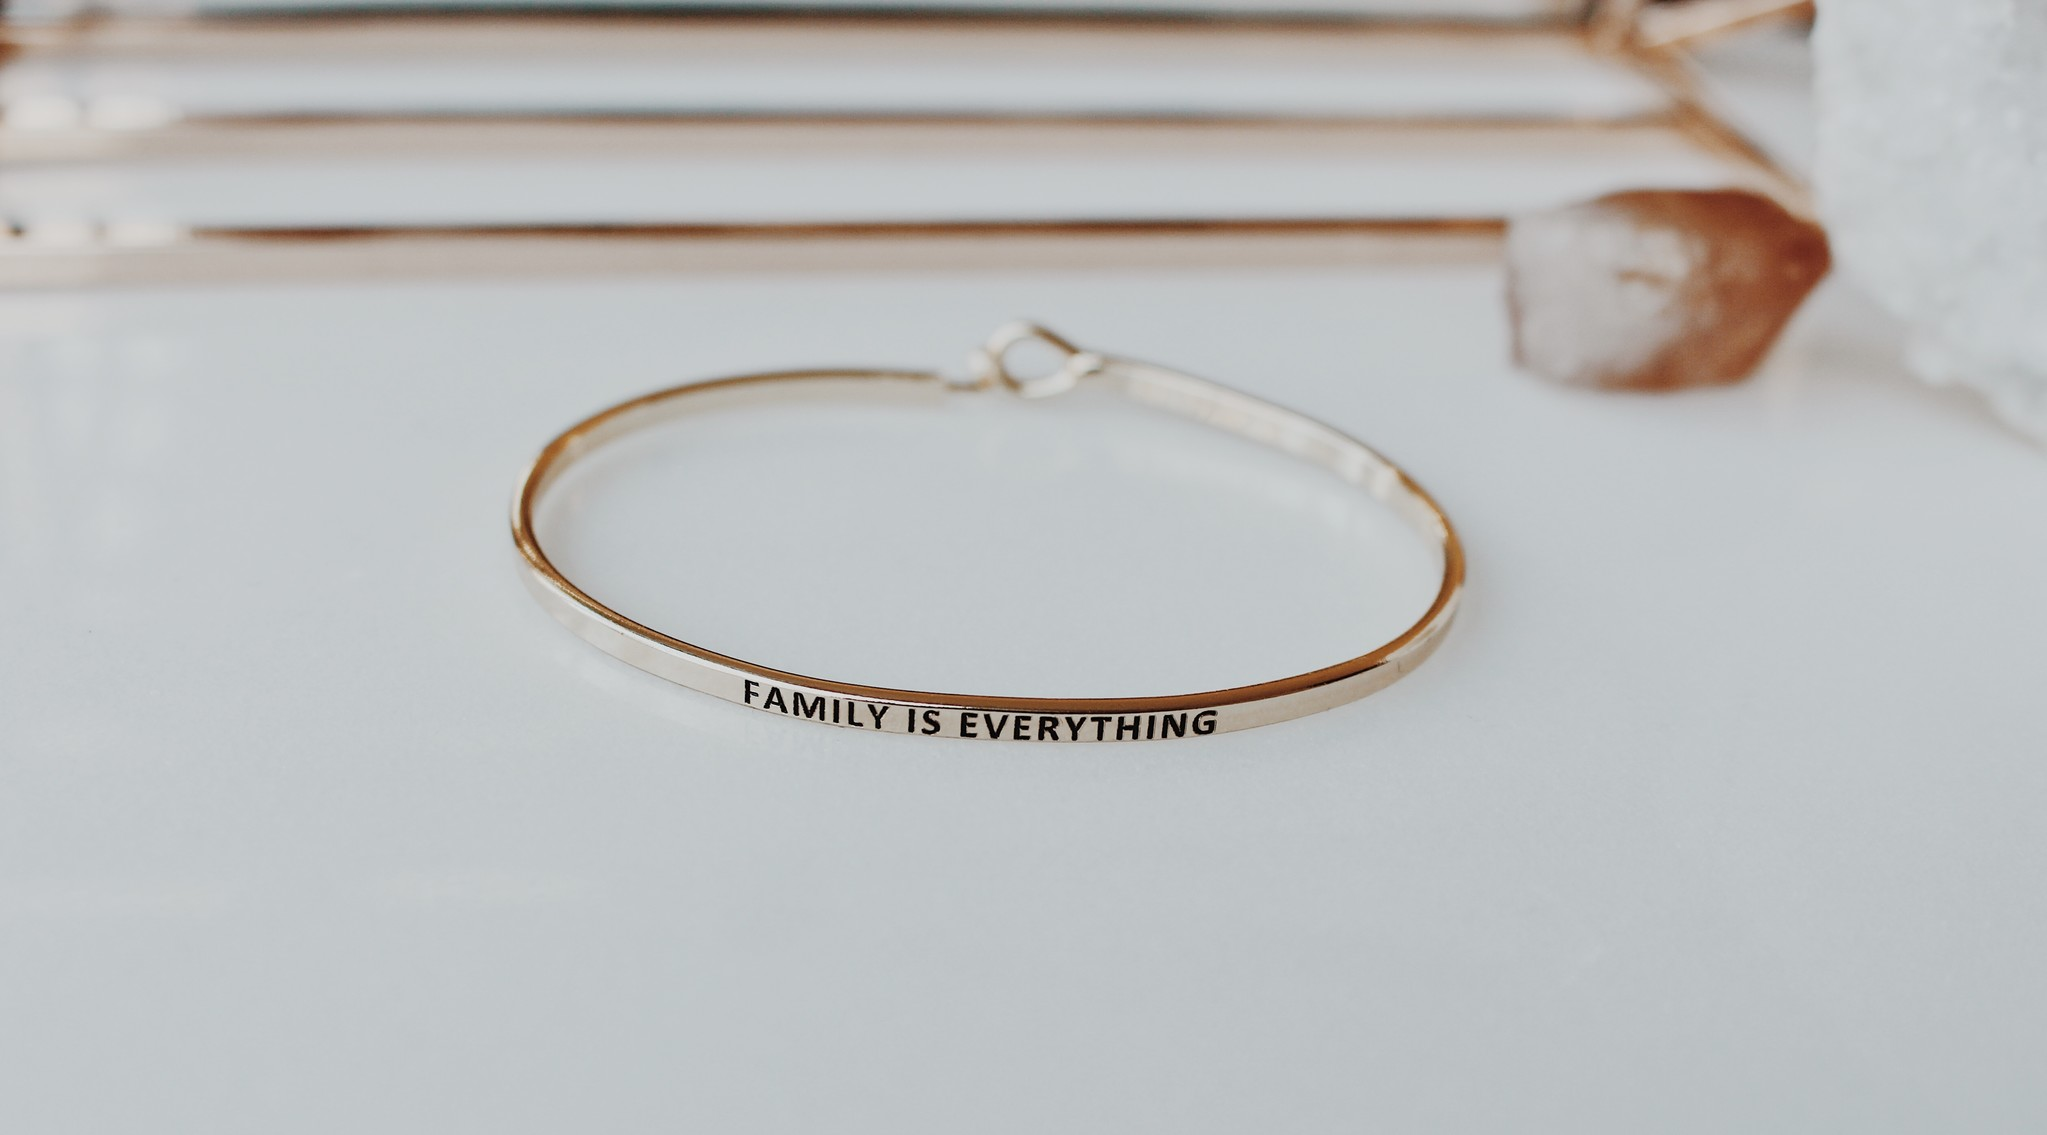 Family Is Everything Bracelet